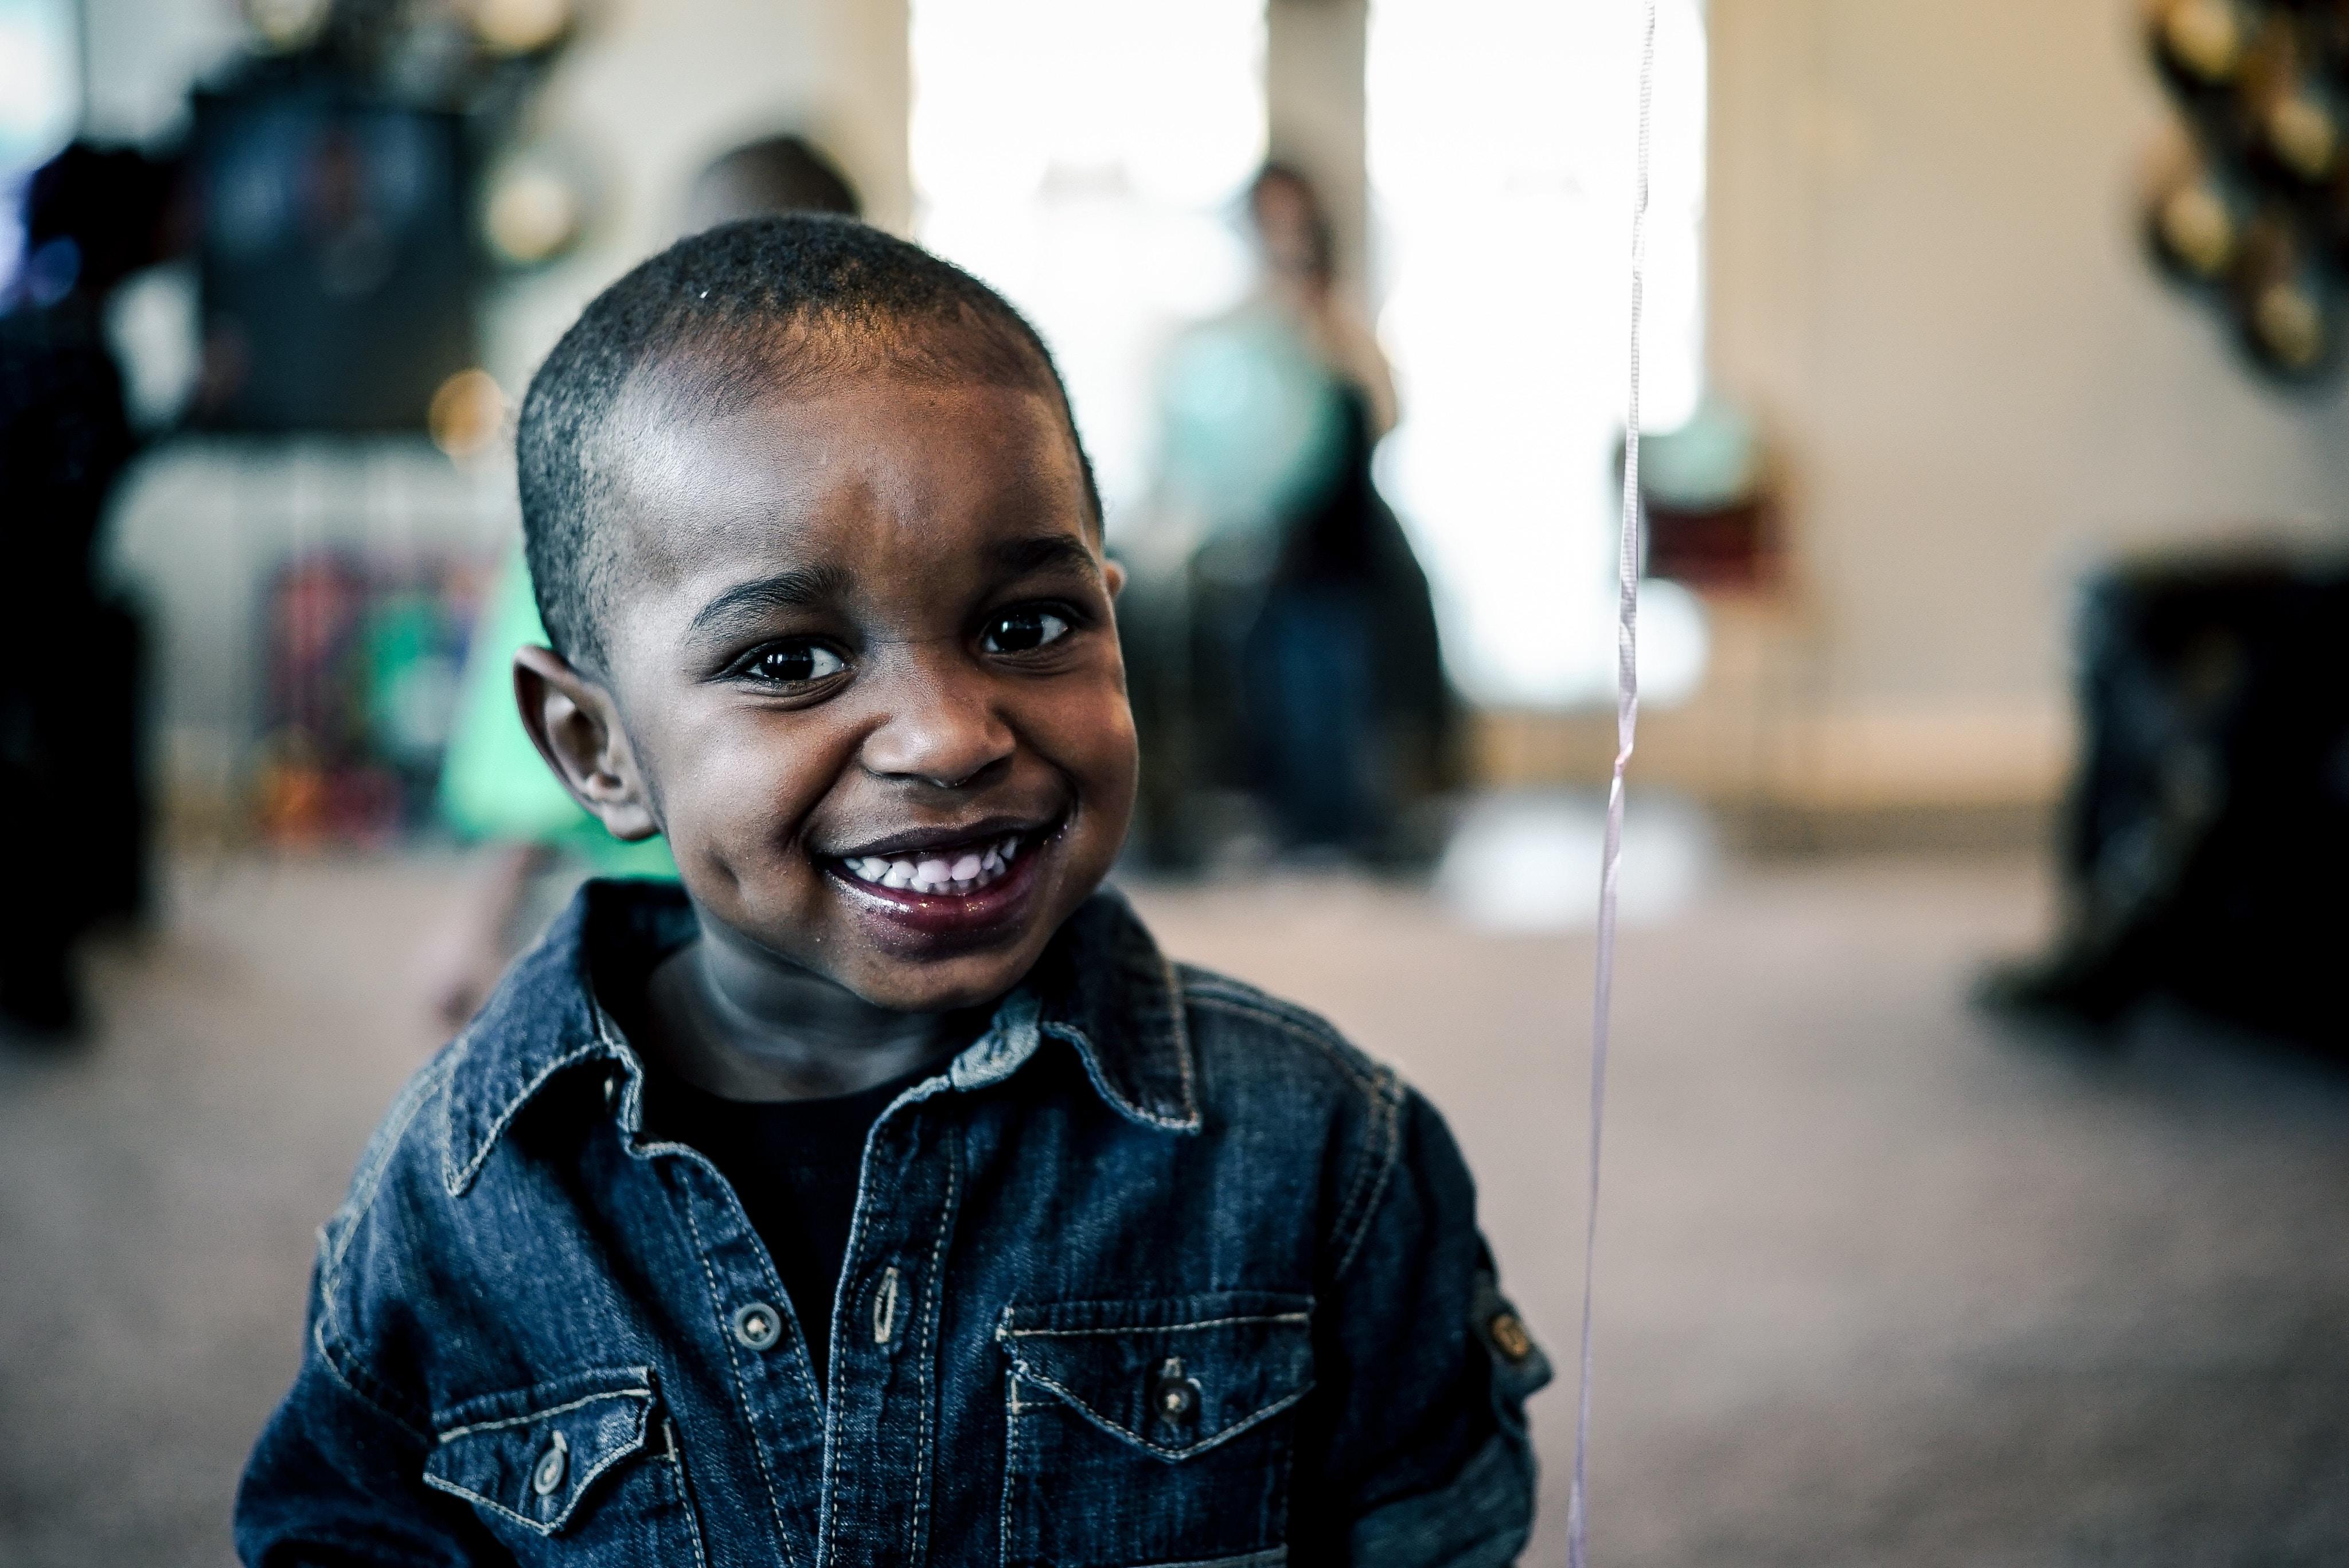 grayscale photo of boy wearing denim jacket smiling near white string